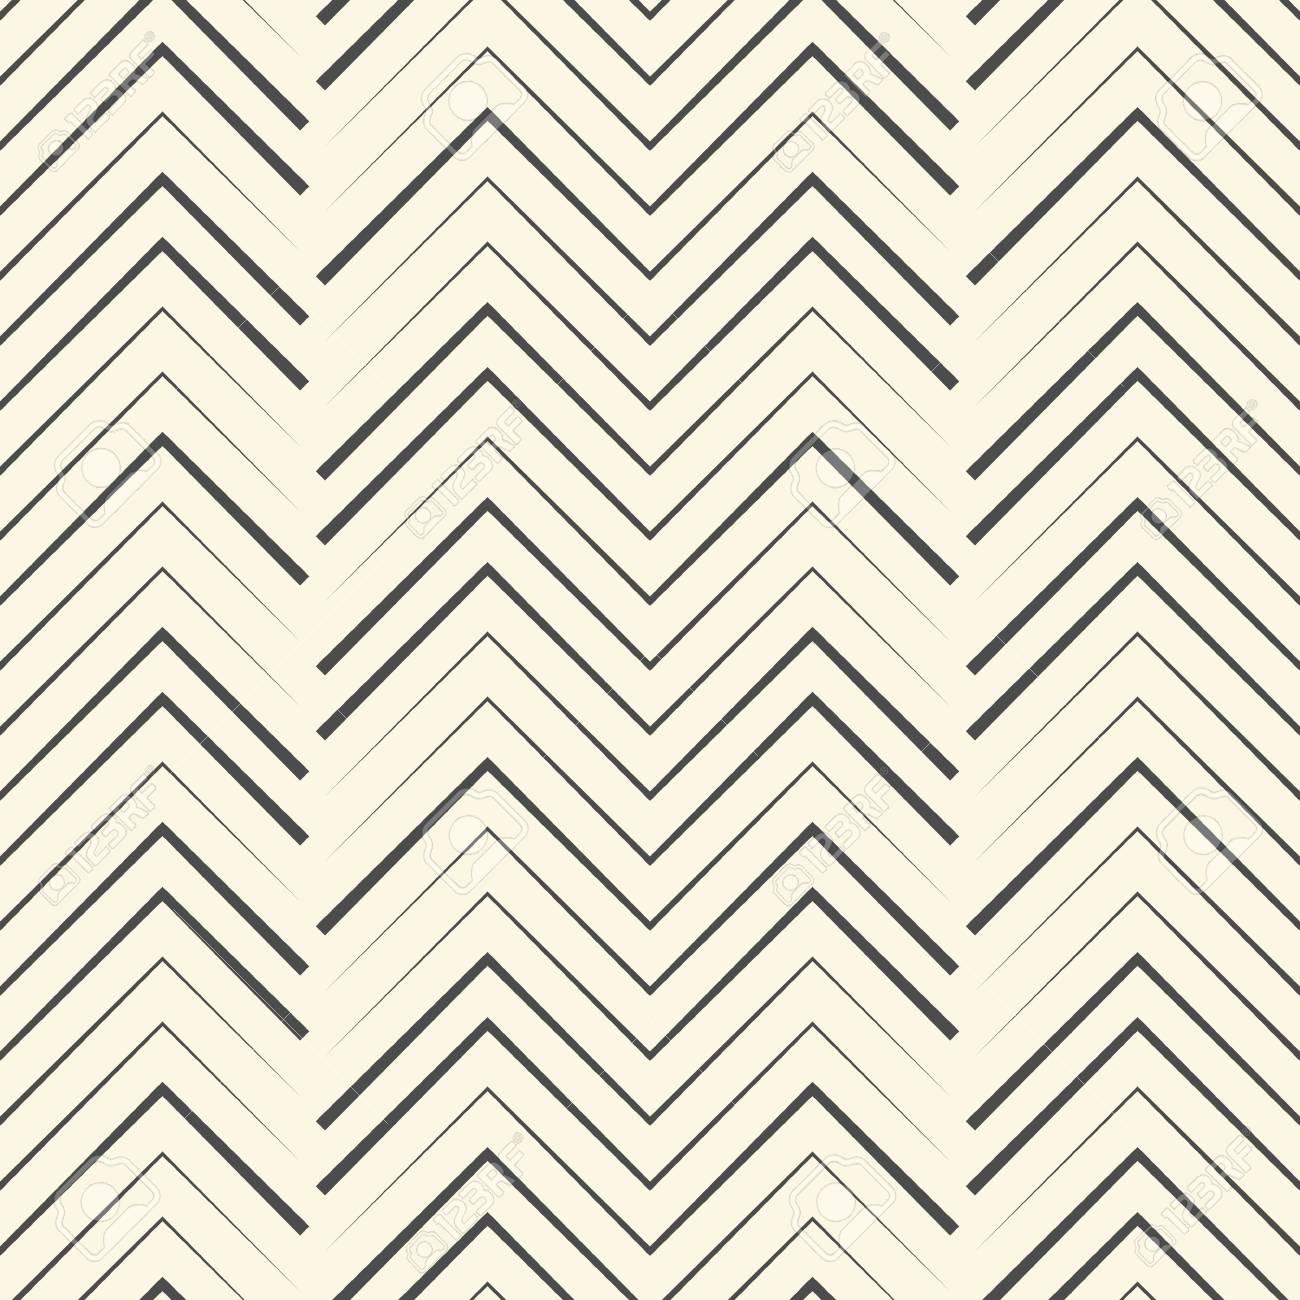 Seamless Zig Zag Wallpaper Minimal Stripe Graphic Design Stylish 1300x1300